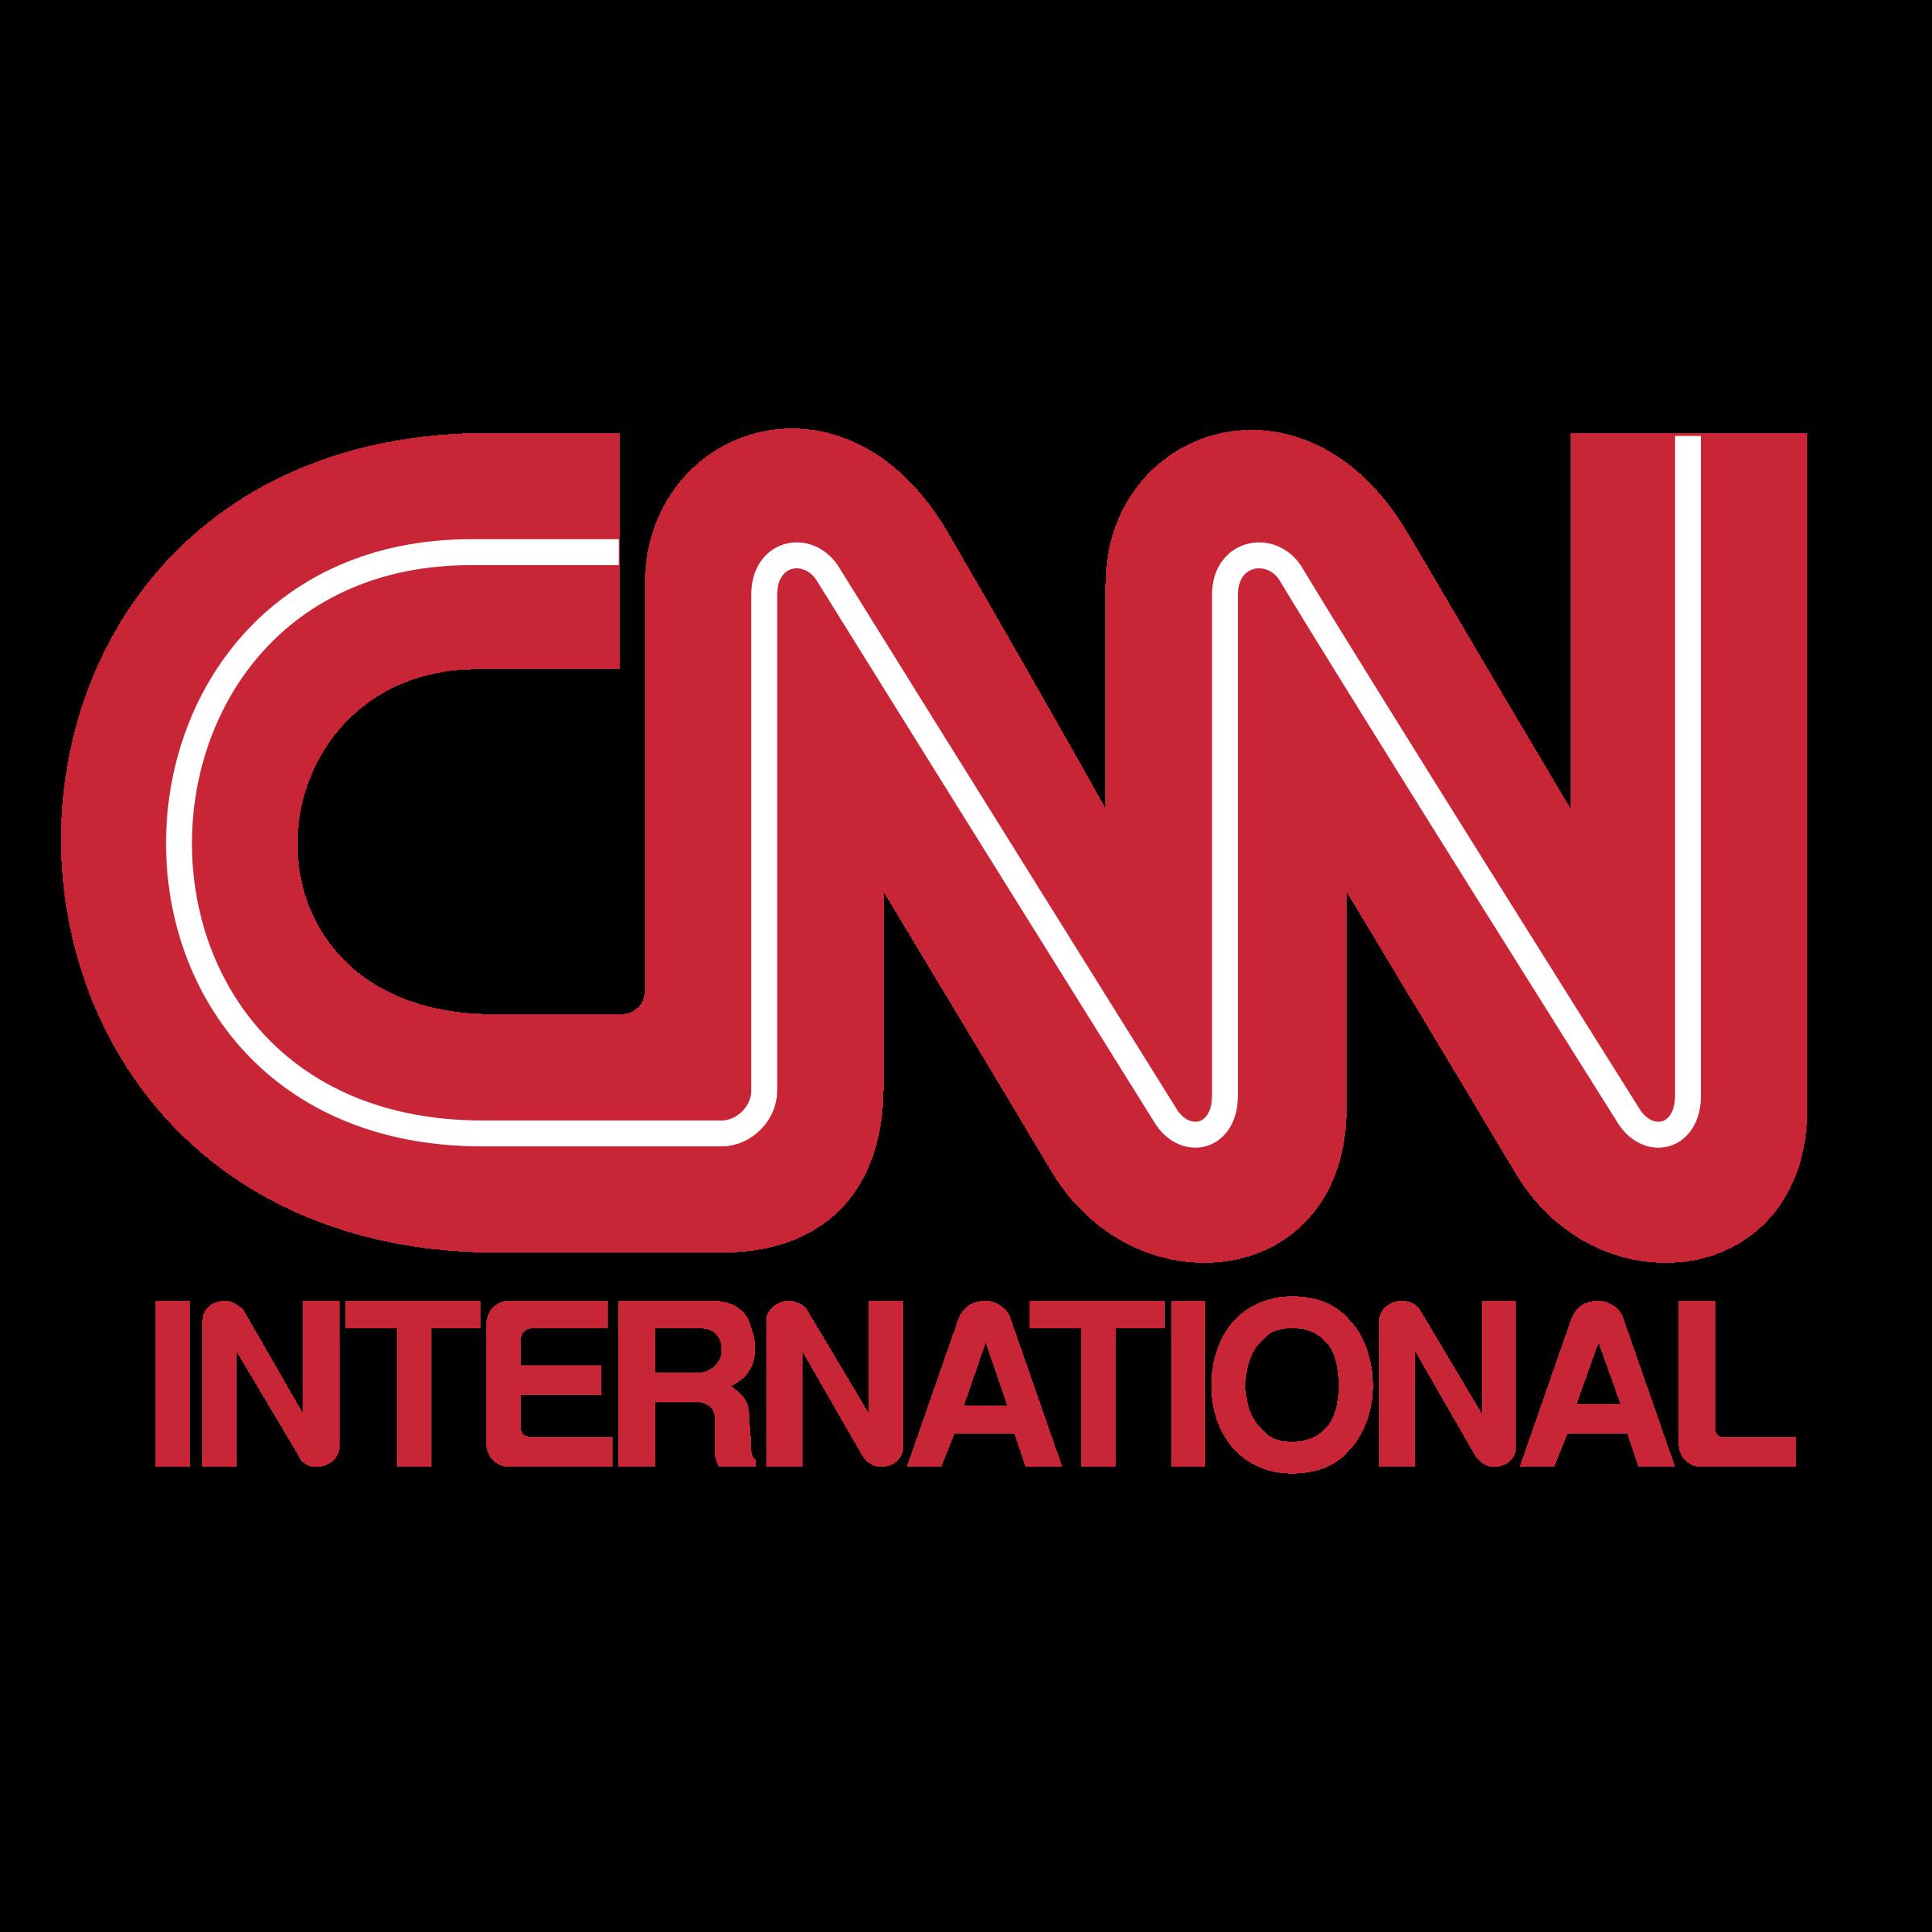 freeuse Cnn logo png transparent. Vector international.